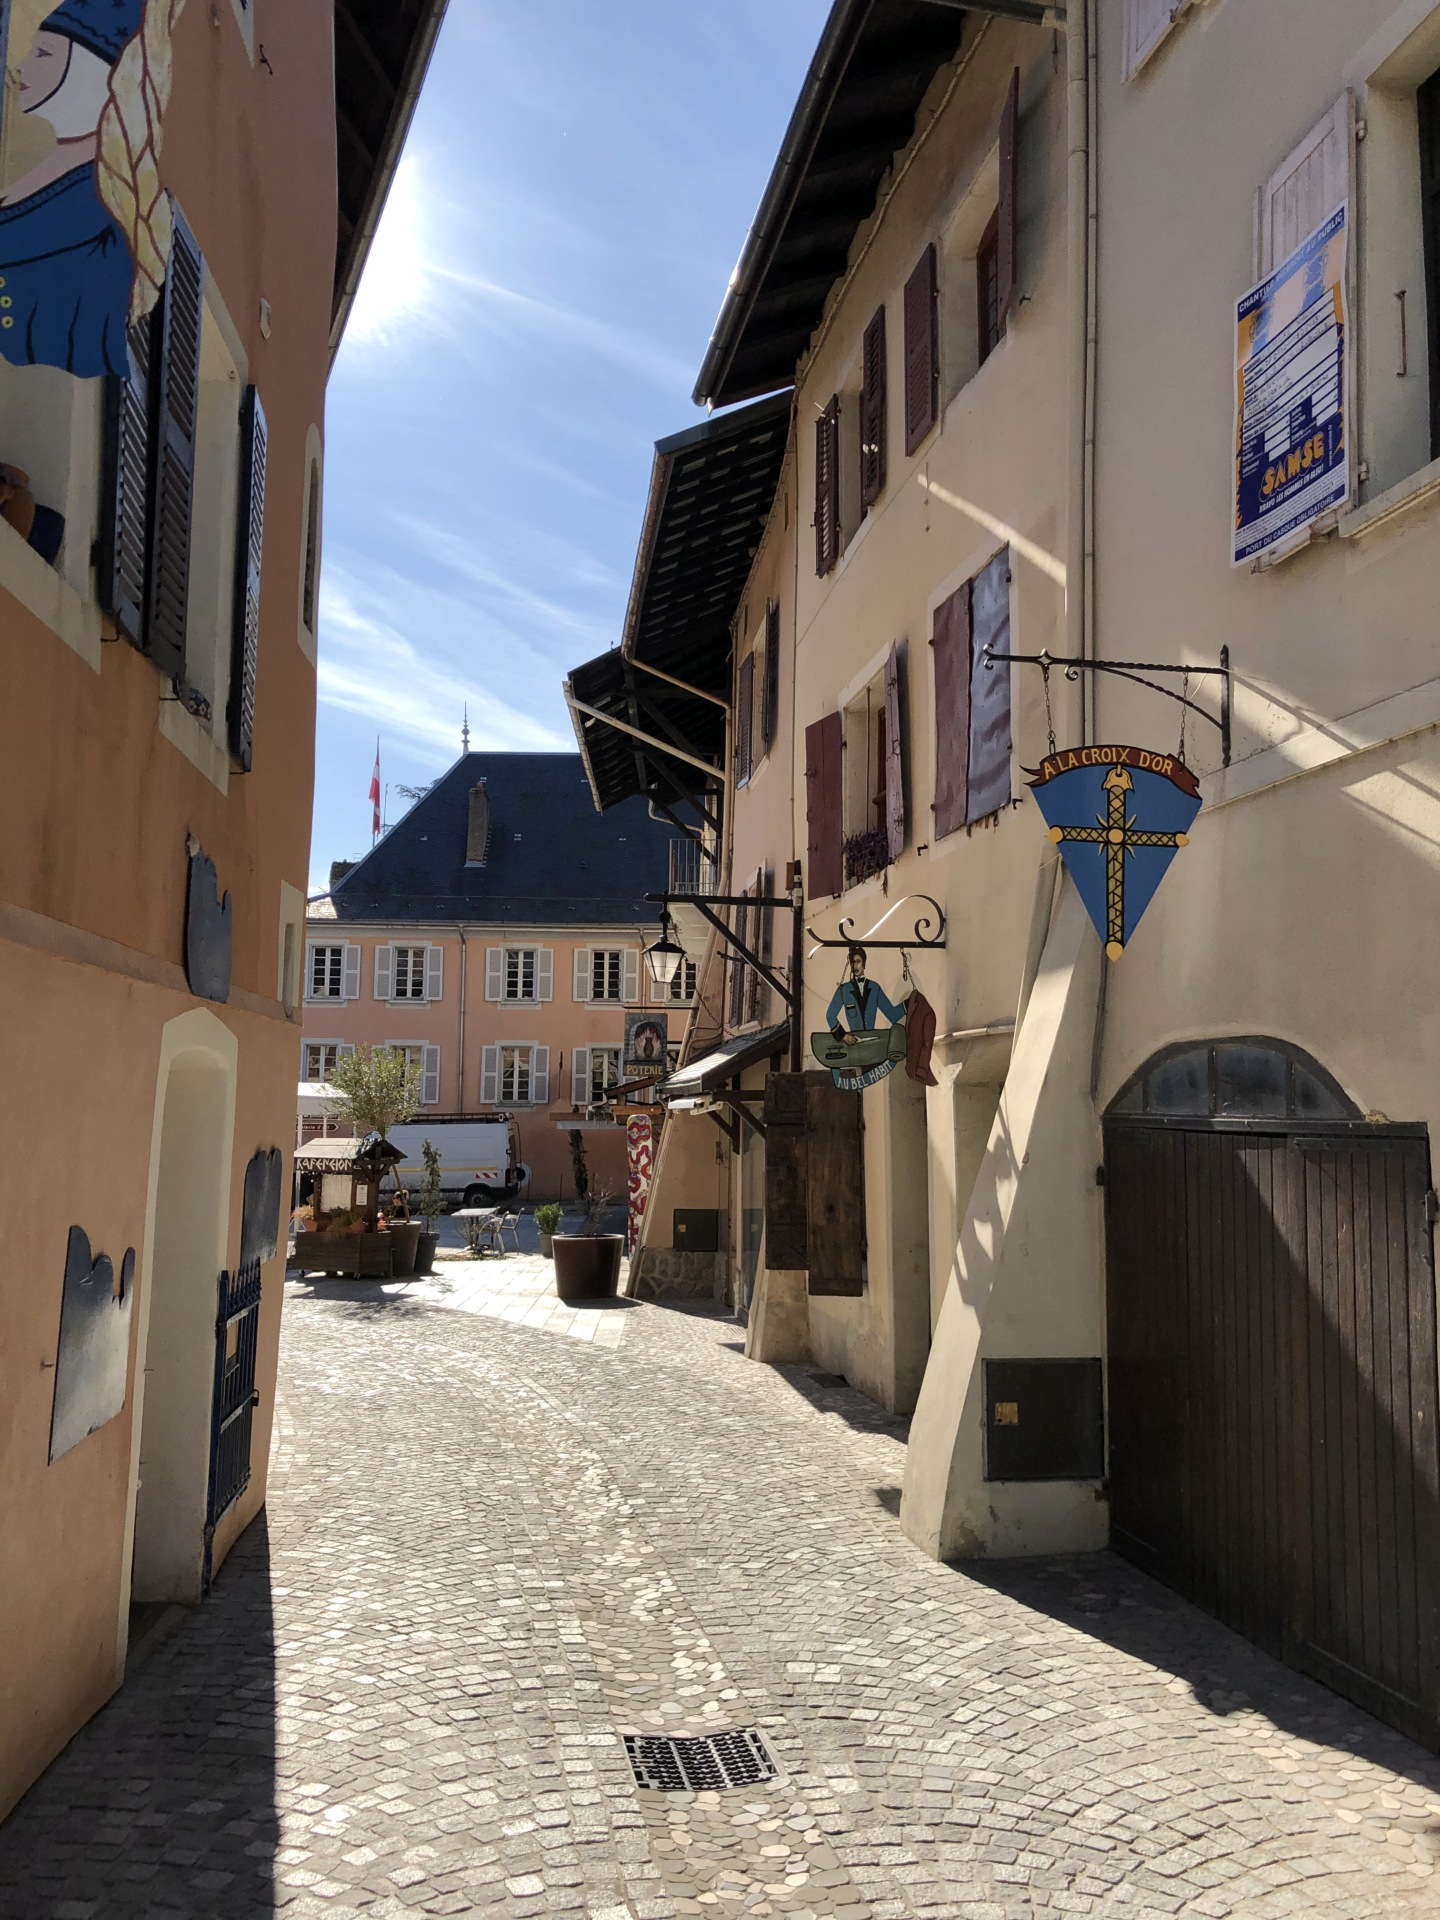 Petites balades en Rhône-Alpes - Page 2 Confla23